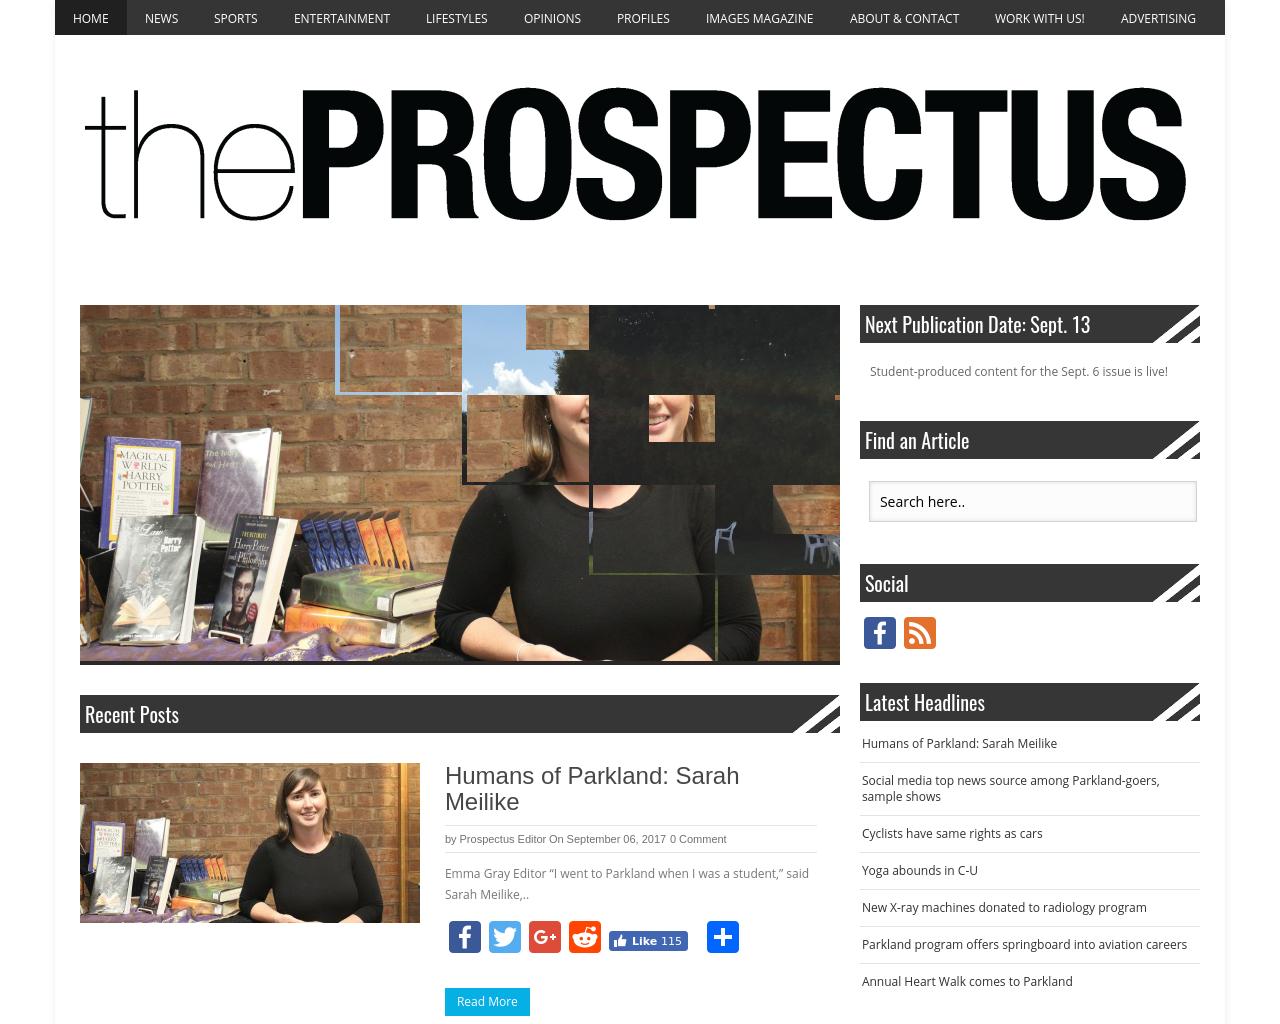 Prospectus-News-Advertising-Reviews-Pricing